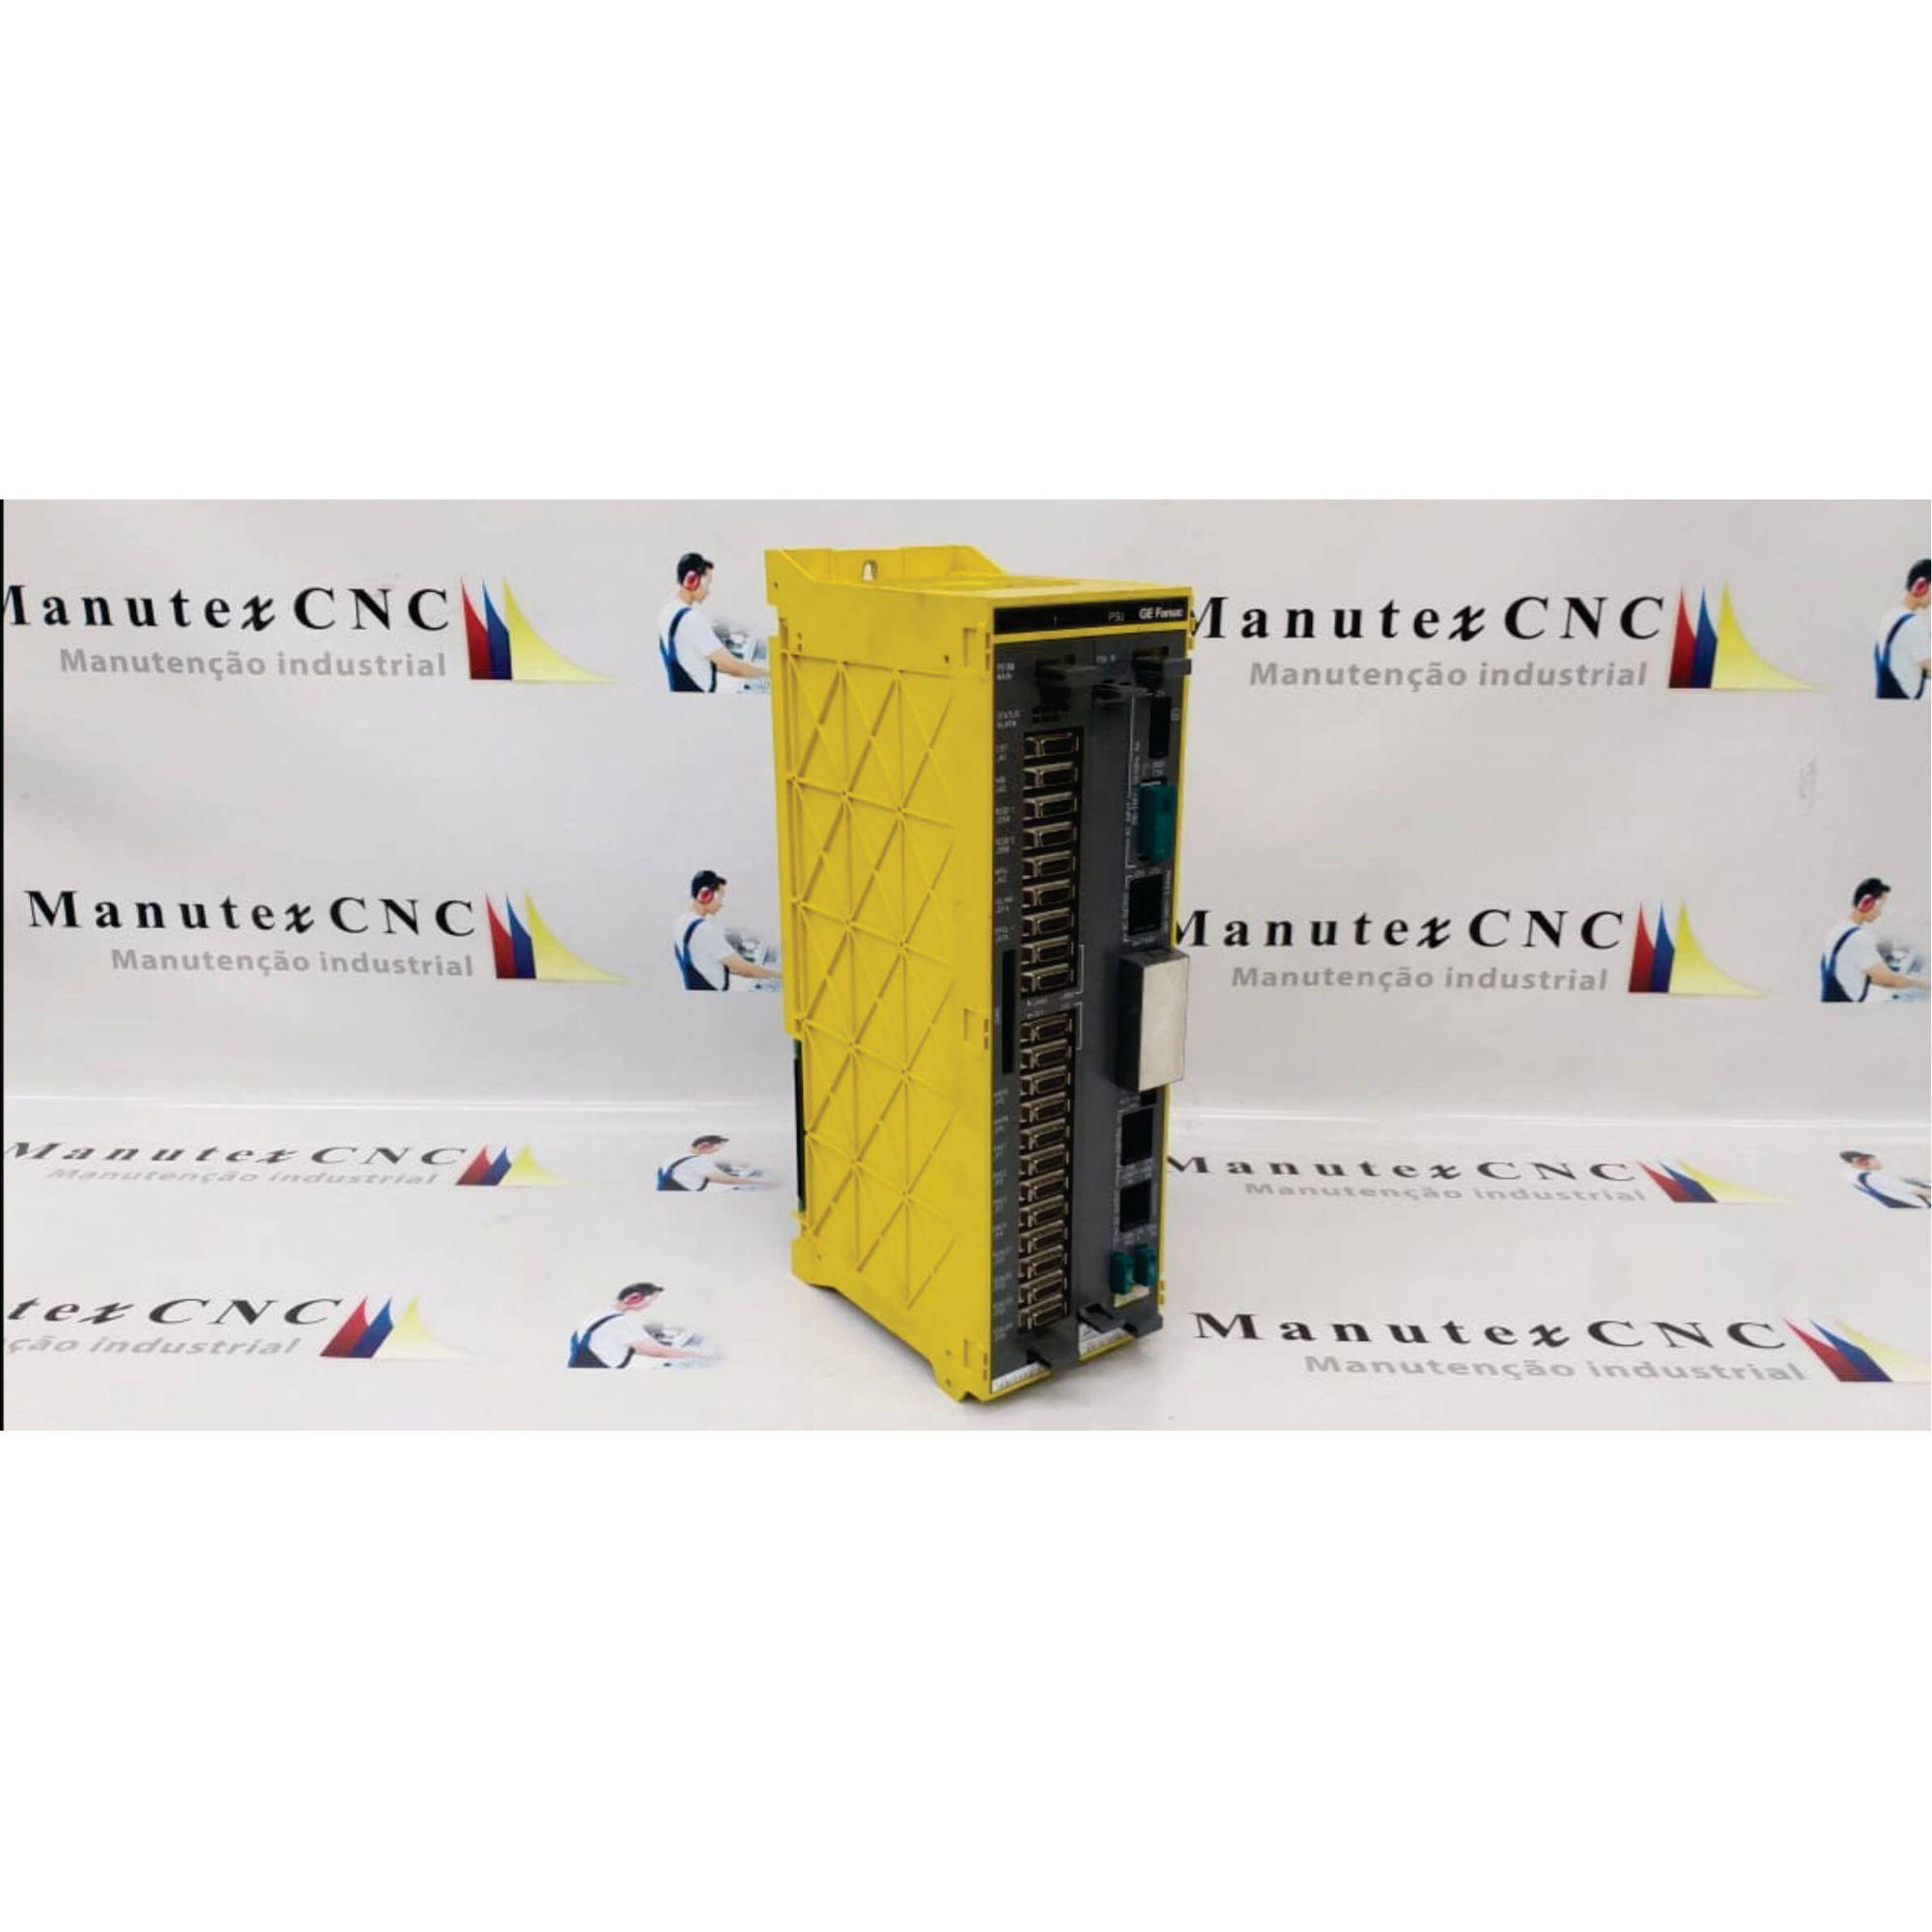 A02B-0216-B502 | 18-TB CNC | FANUC